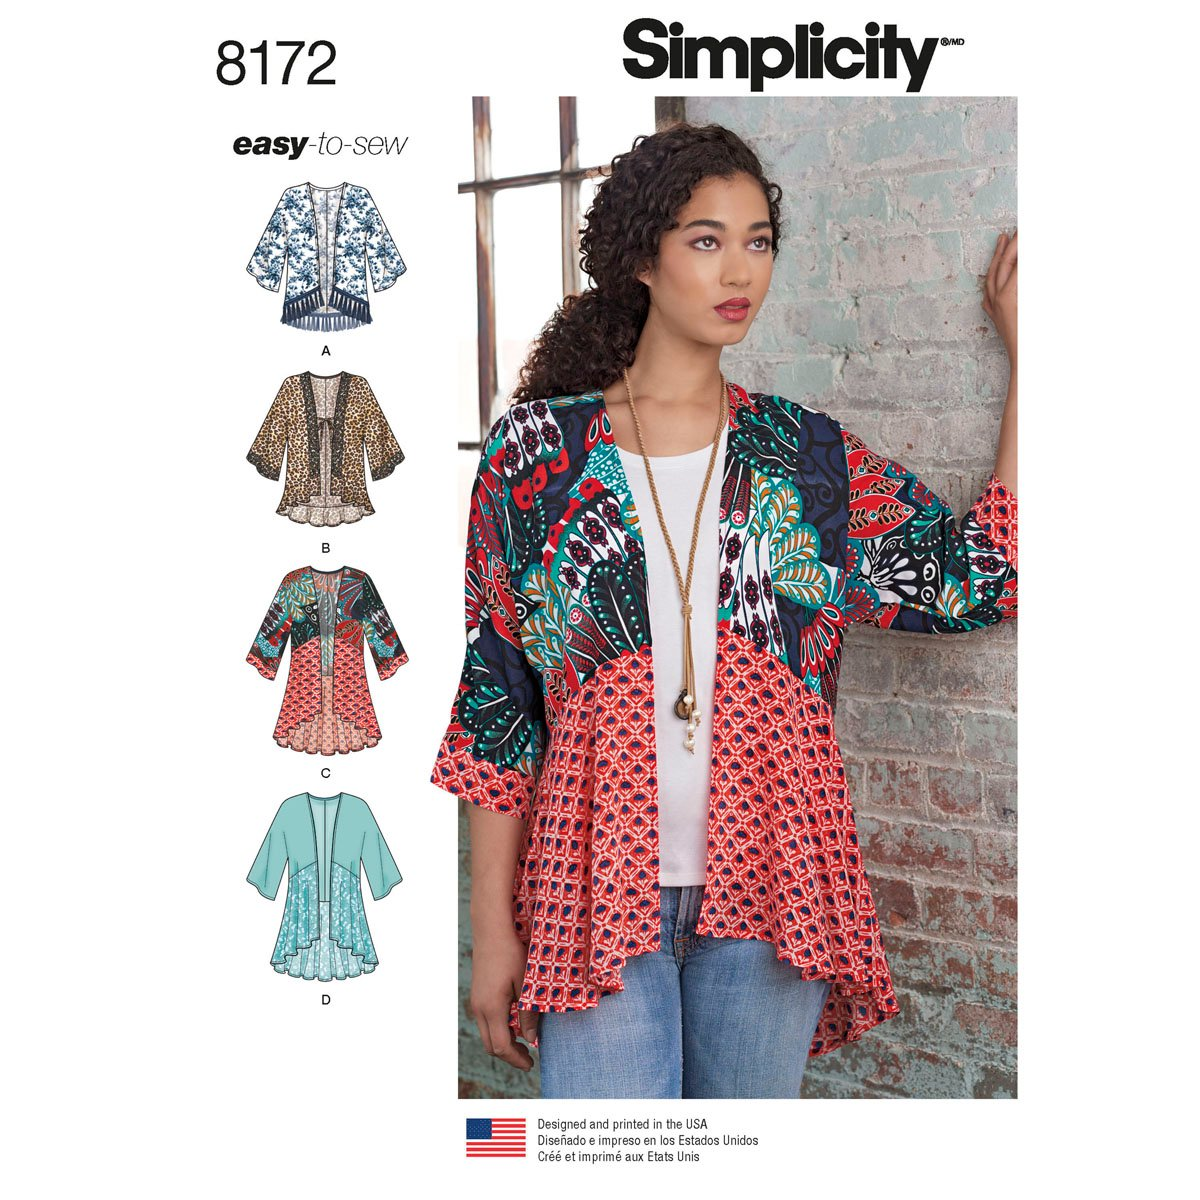 Simplicity 8172 Misses' kimonos